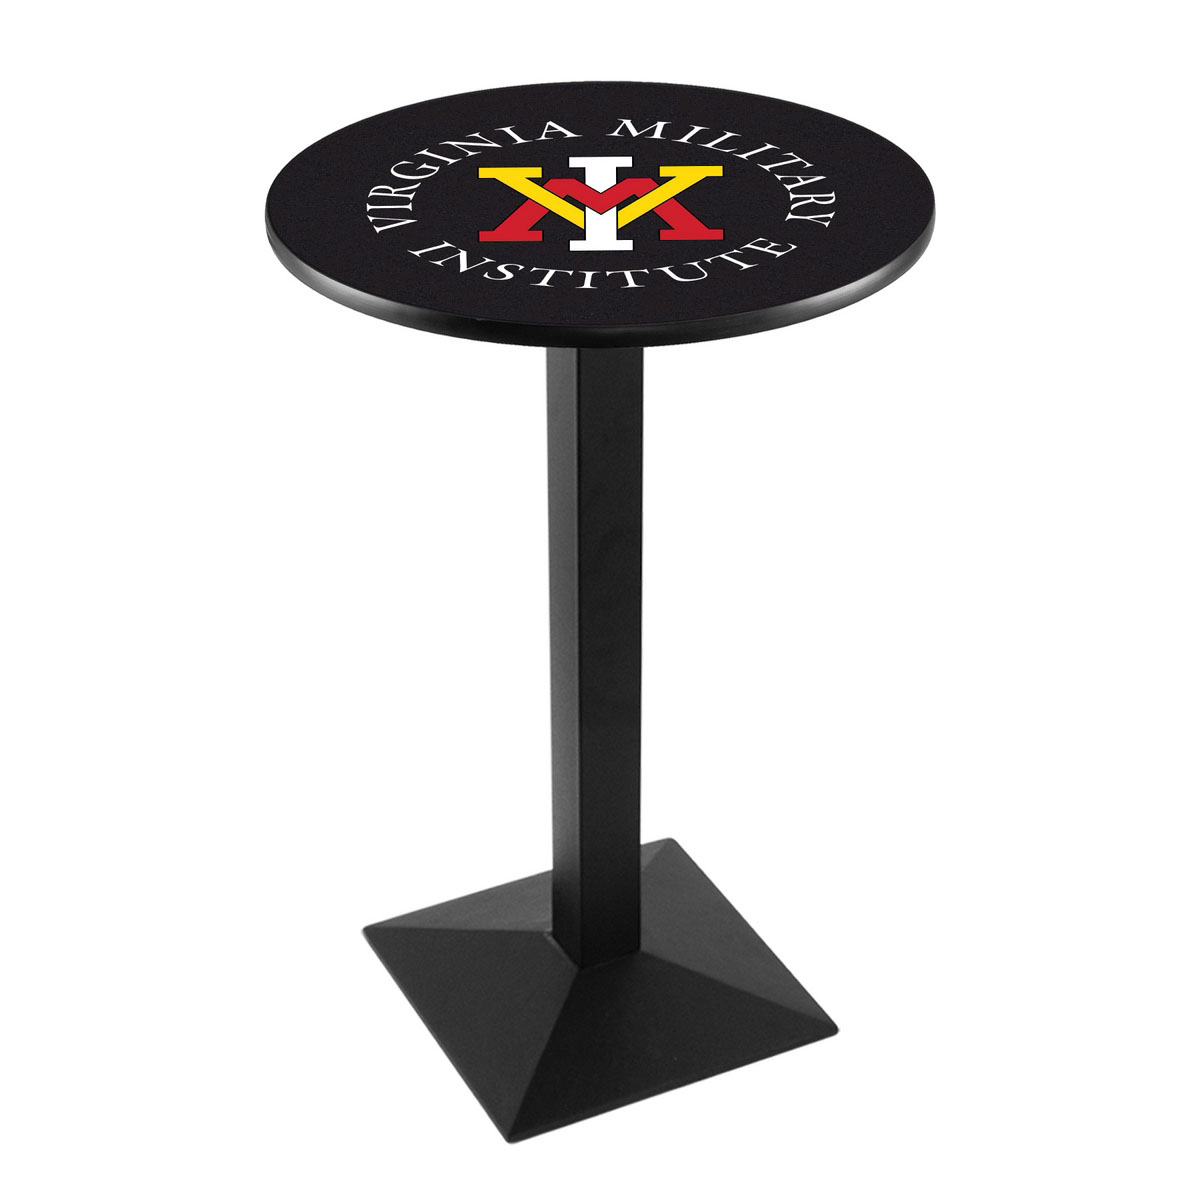 Trustworthy Virginia Military Institute Logo Pub Bar Table Square Stand Product Photo